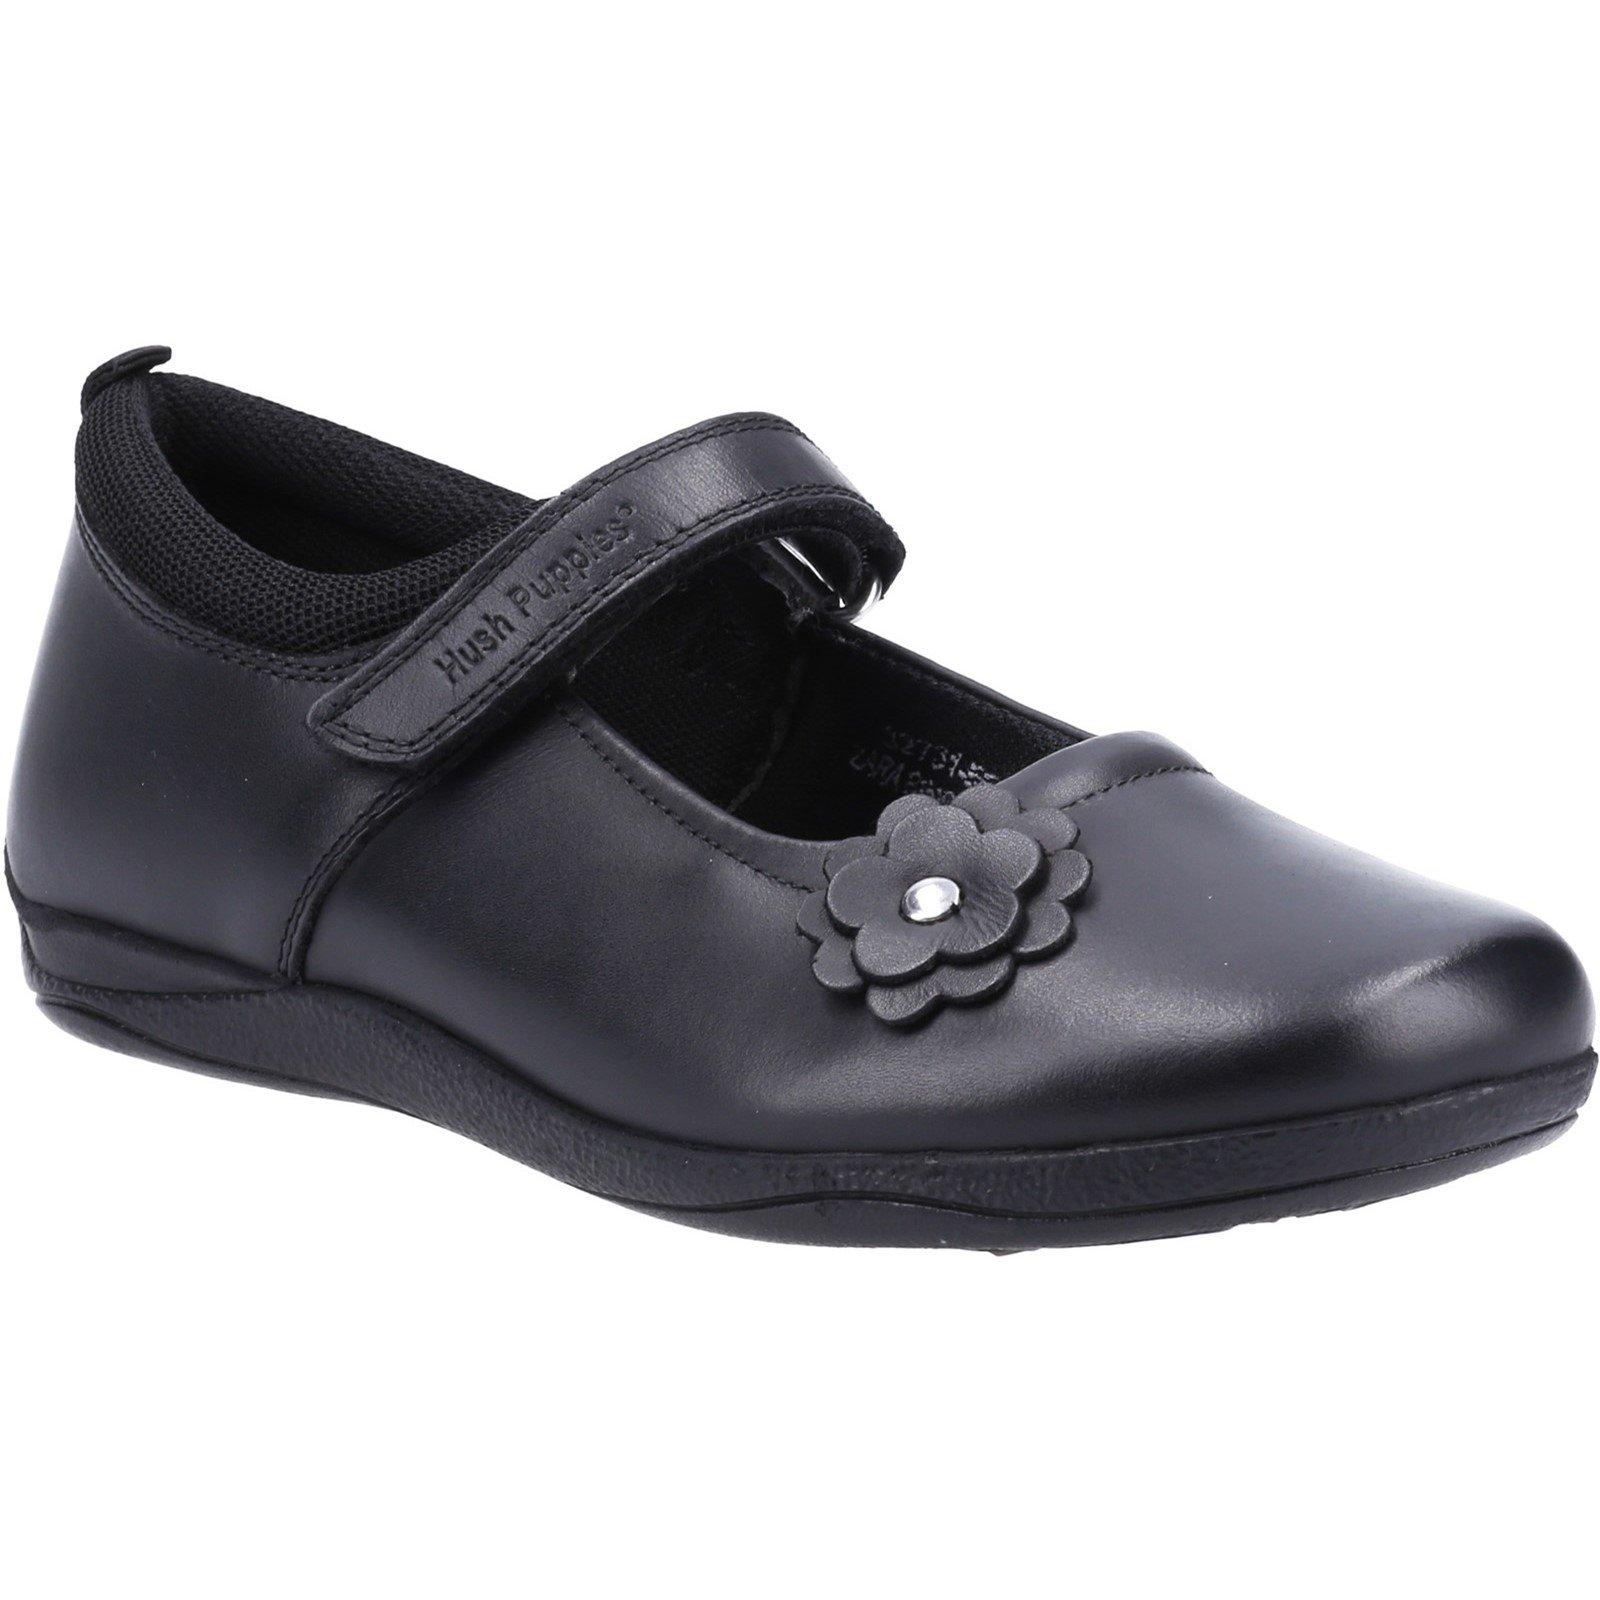 Hush Puppies Kid's Zara Junior School Flat Shoe Black 32731 - Black 1